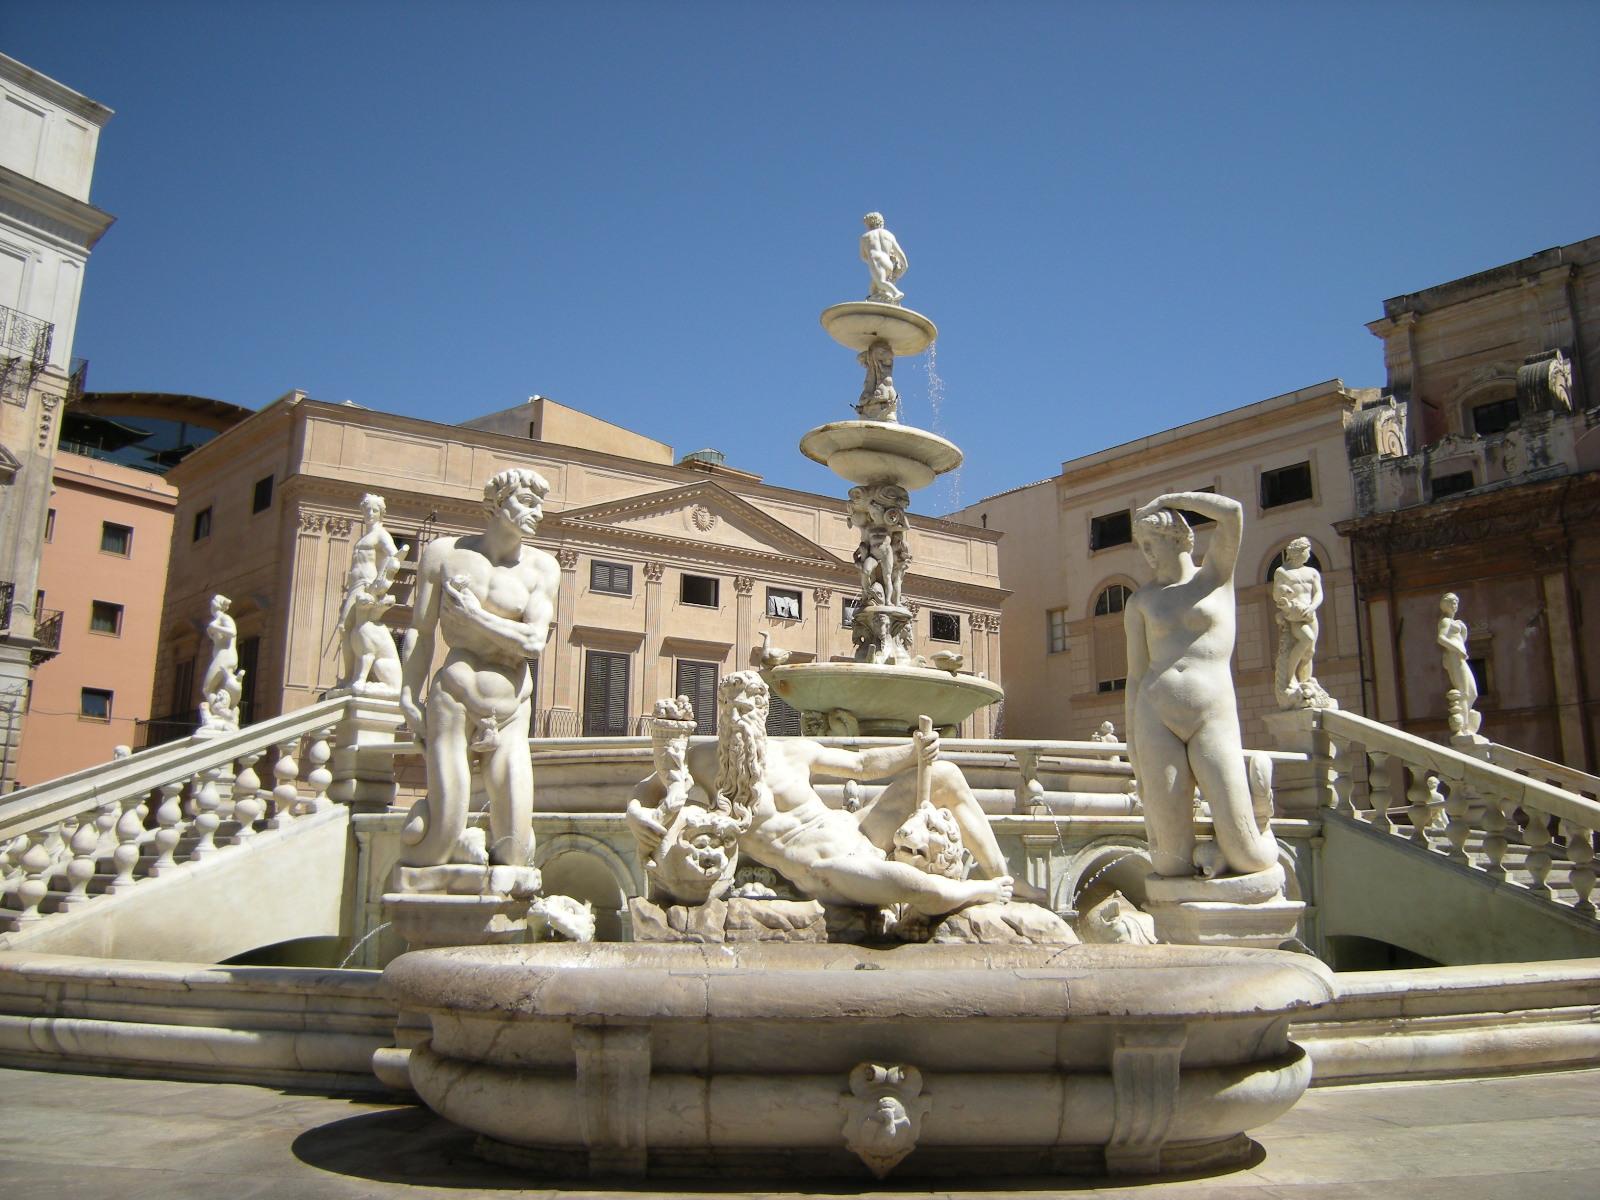 File:Fontana Pretoria (2785919487).jpg - Wikimedia Commons